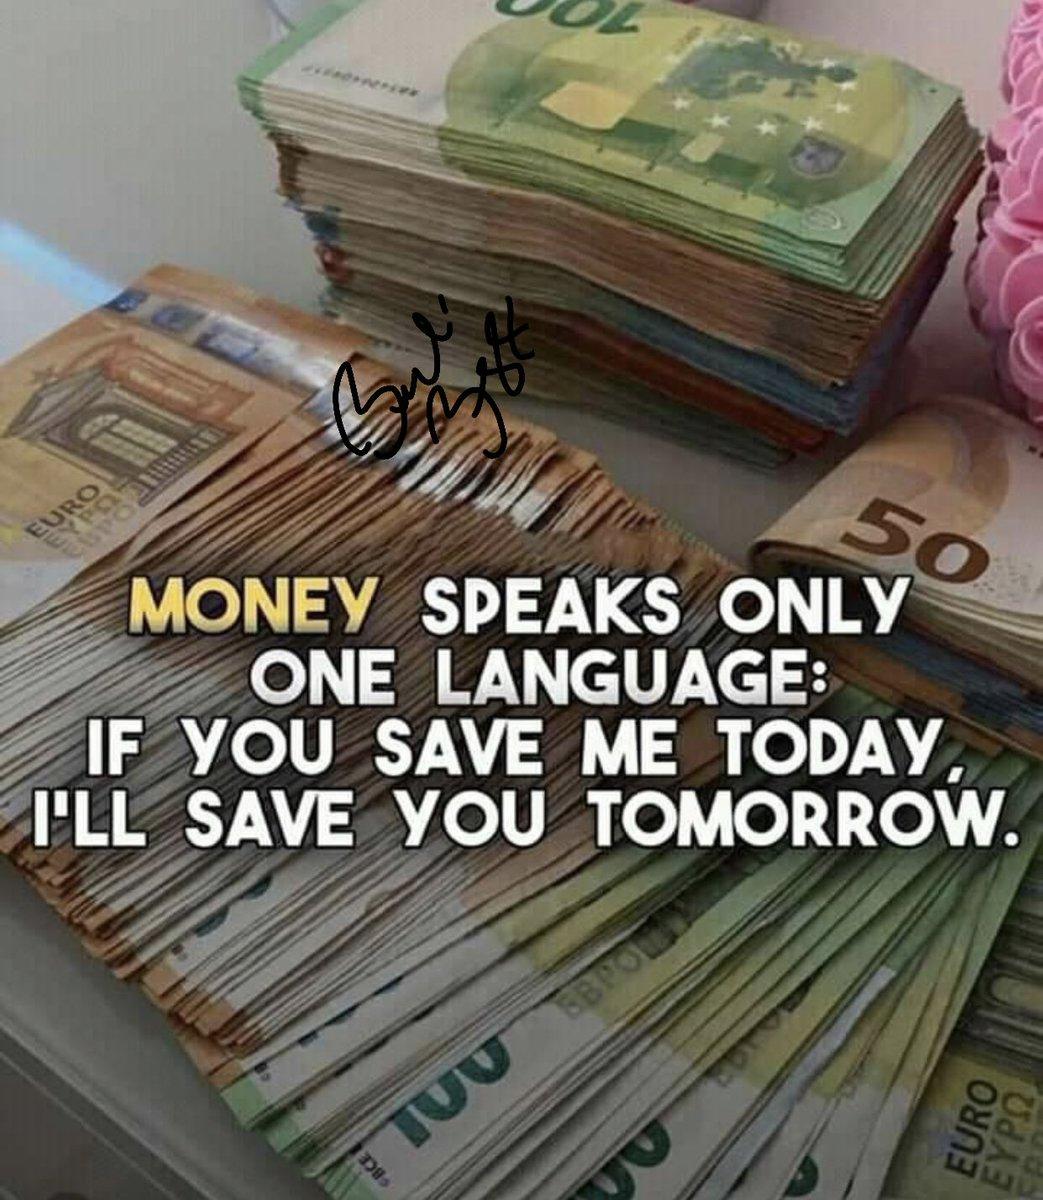 #losangeles #moneytalks #entrepreneurlife #podcasts #entrepreneurs #successminded #likeforlike #mindset #entrepreneurmindset #goodvibes #producer #entrepreneurship #goals #grind #photography #blogger #businessmoney #femaleentrepreneur #motivation #lifestyle #success